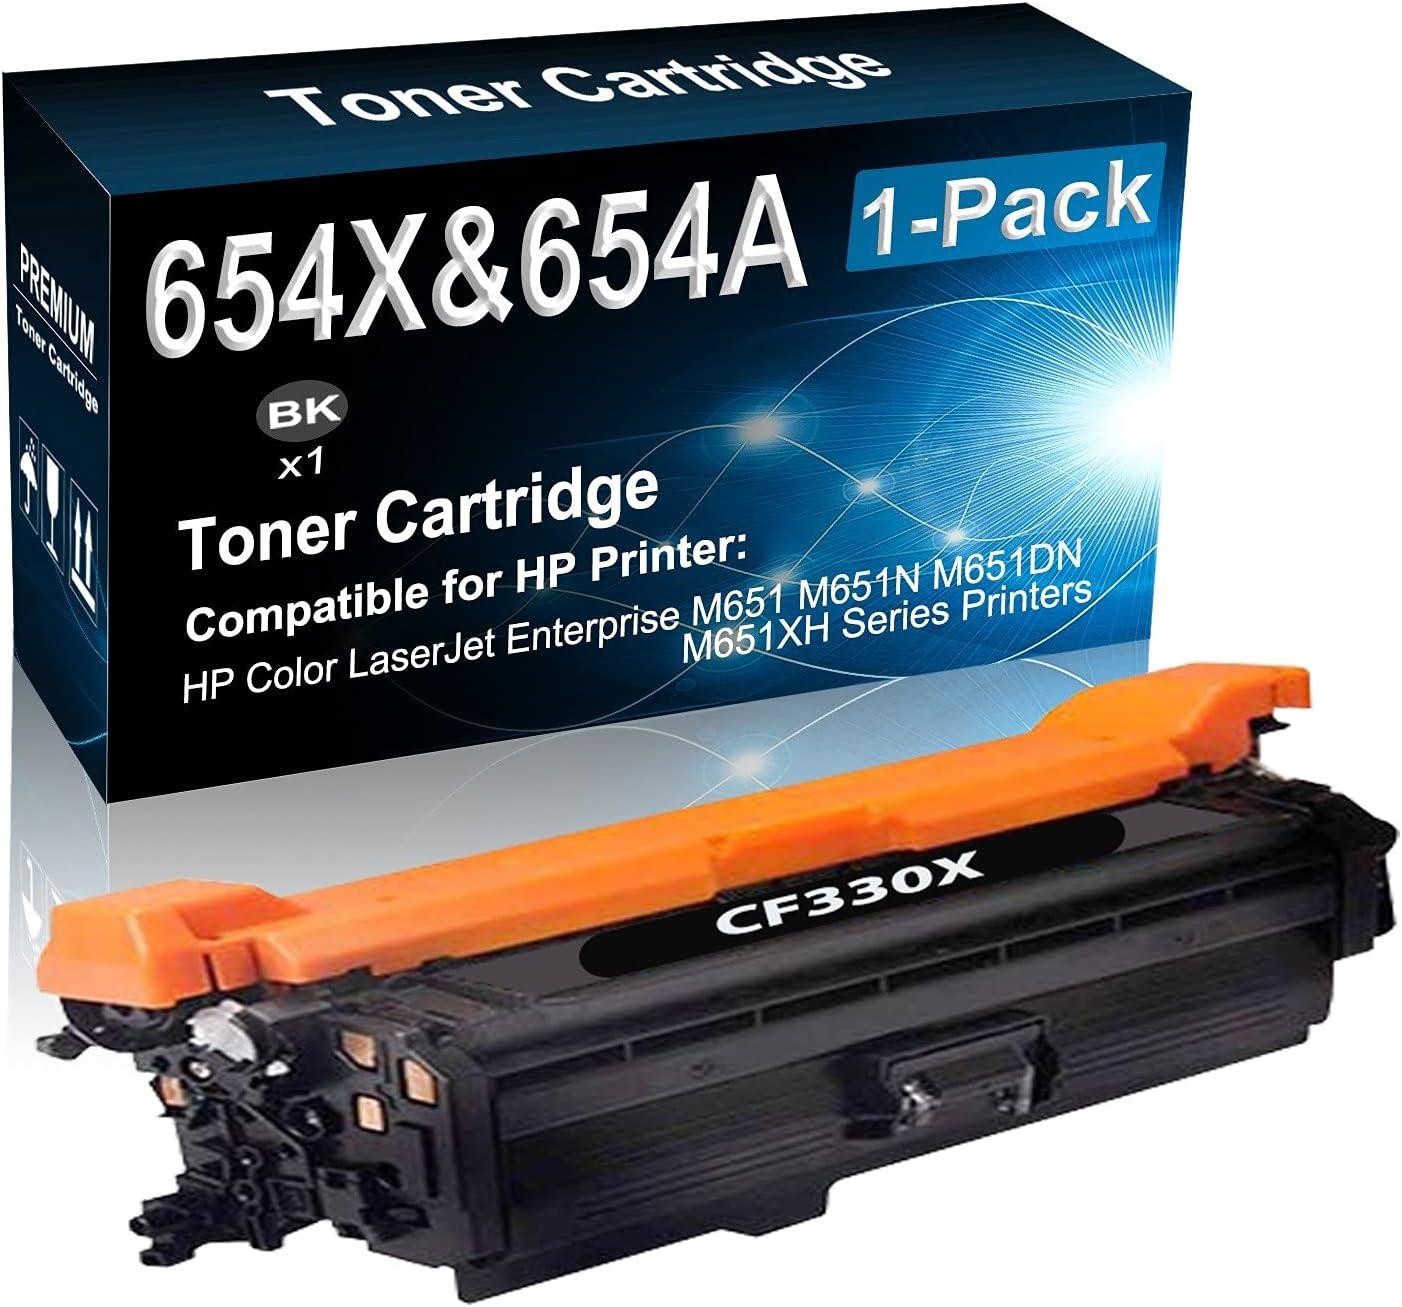 1-Pack (Black) Compatible M651 M651N M651DN M651XH Color Toner Cartridge (High Capacity) Replacement for HP 654X 654A (CF330X) Printer Toner Cartridge